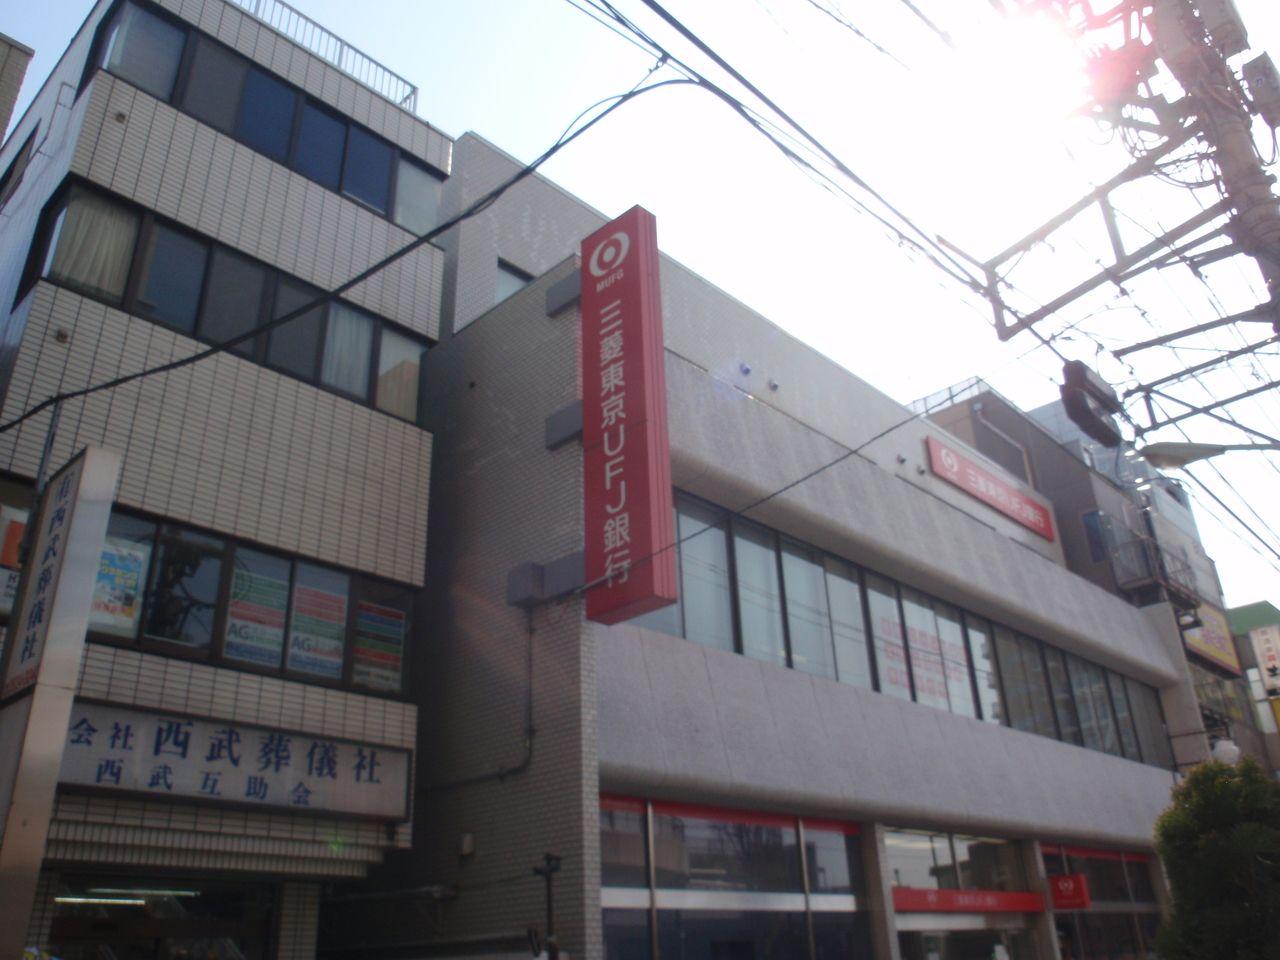 保谷駅前の三菱UFJ銀行